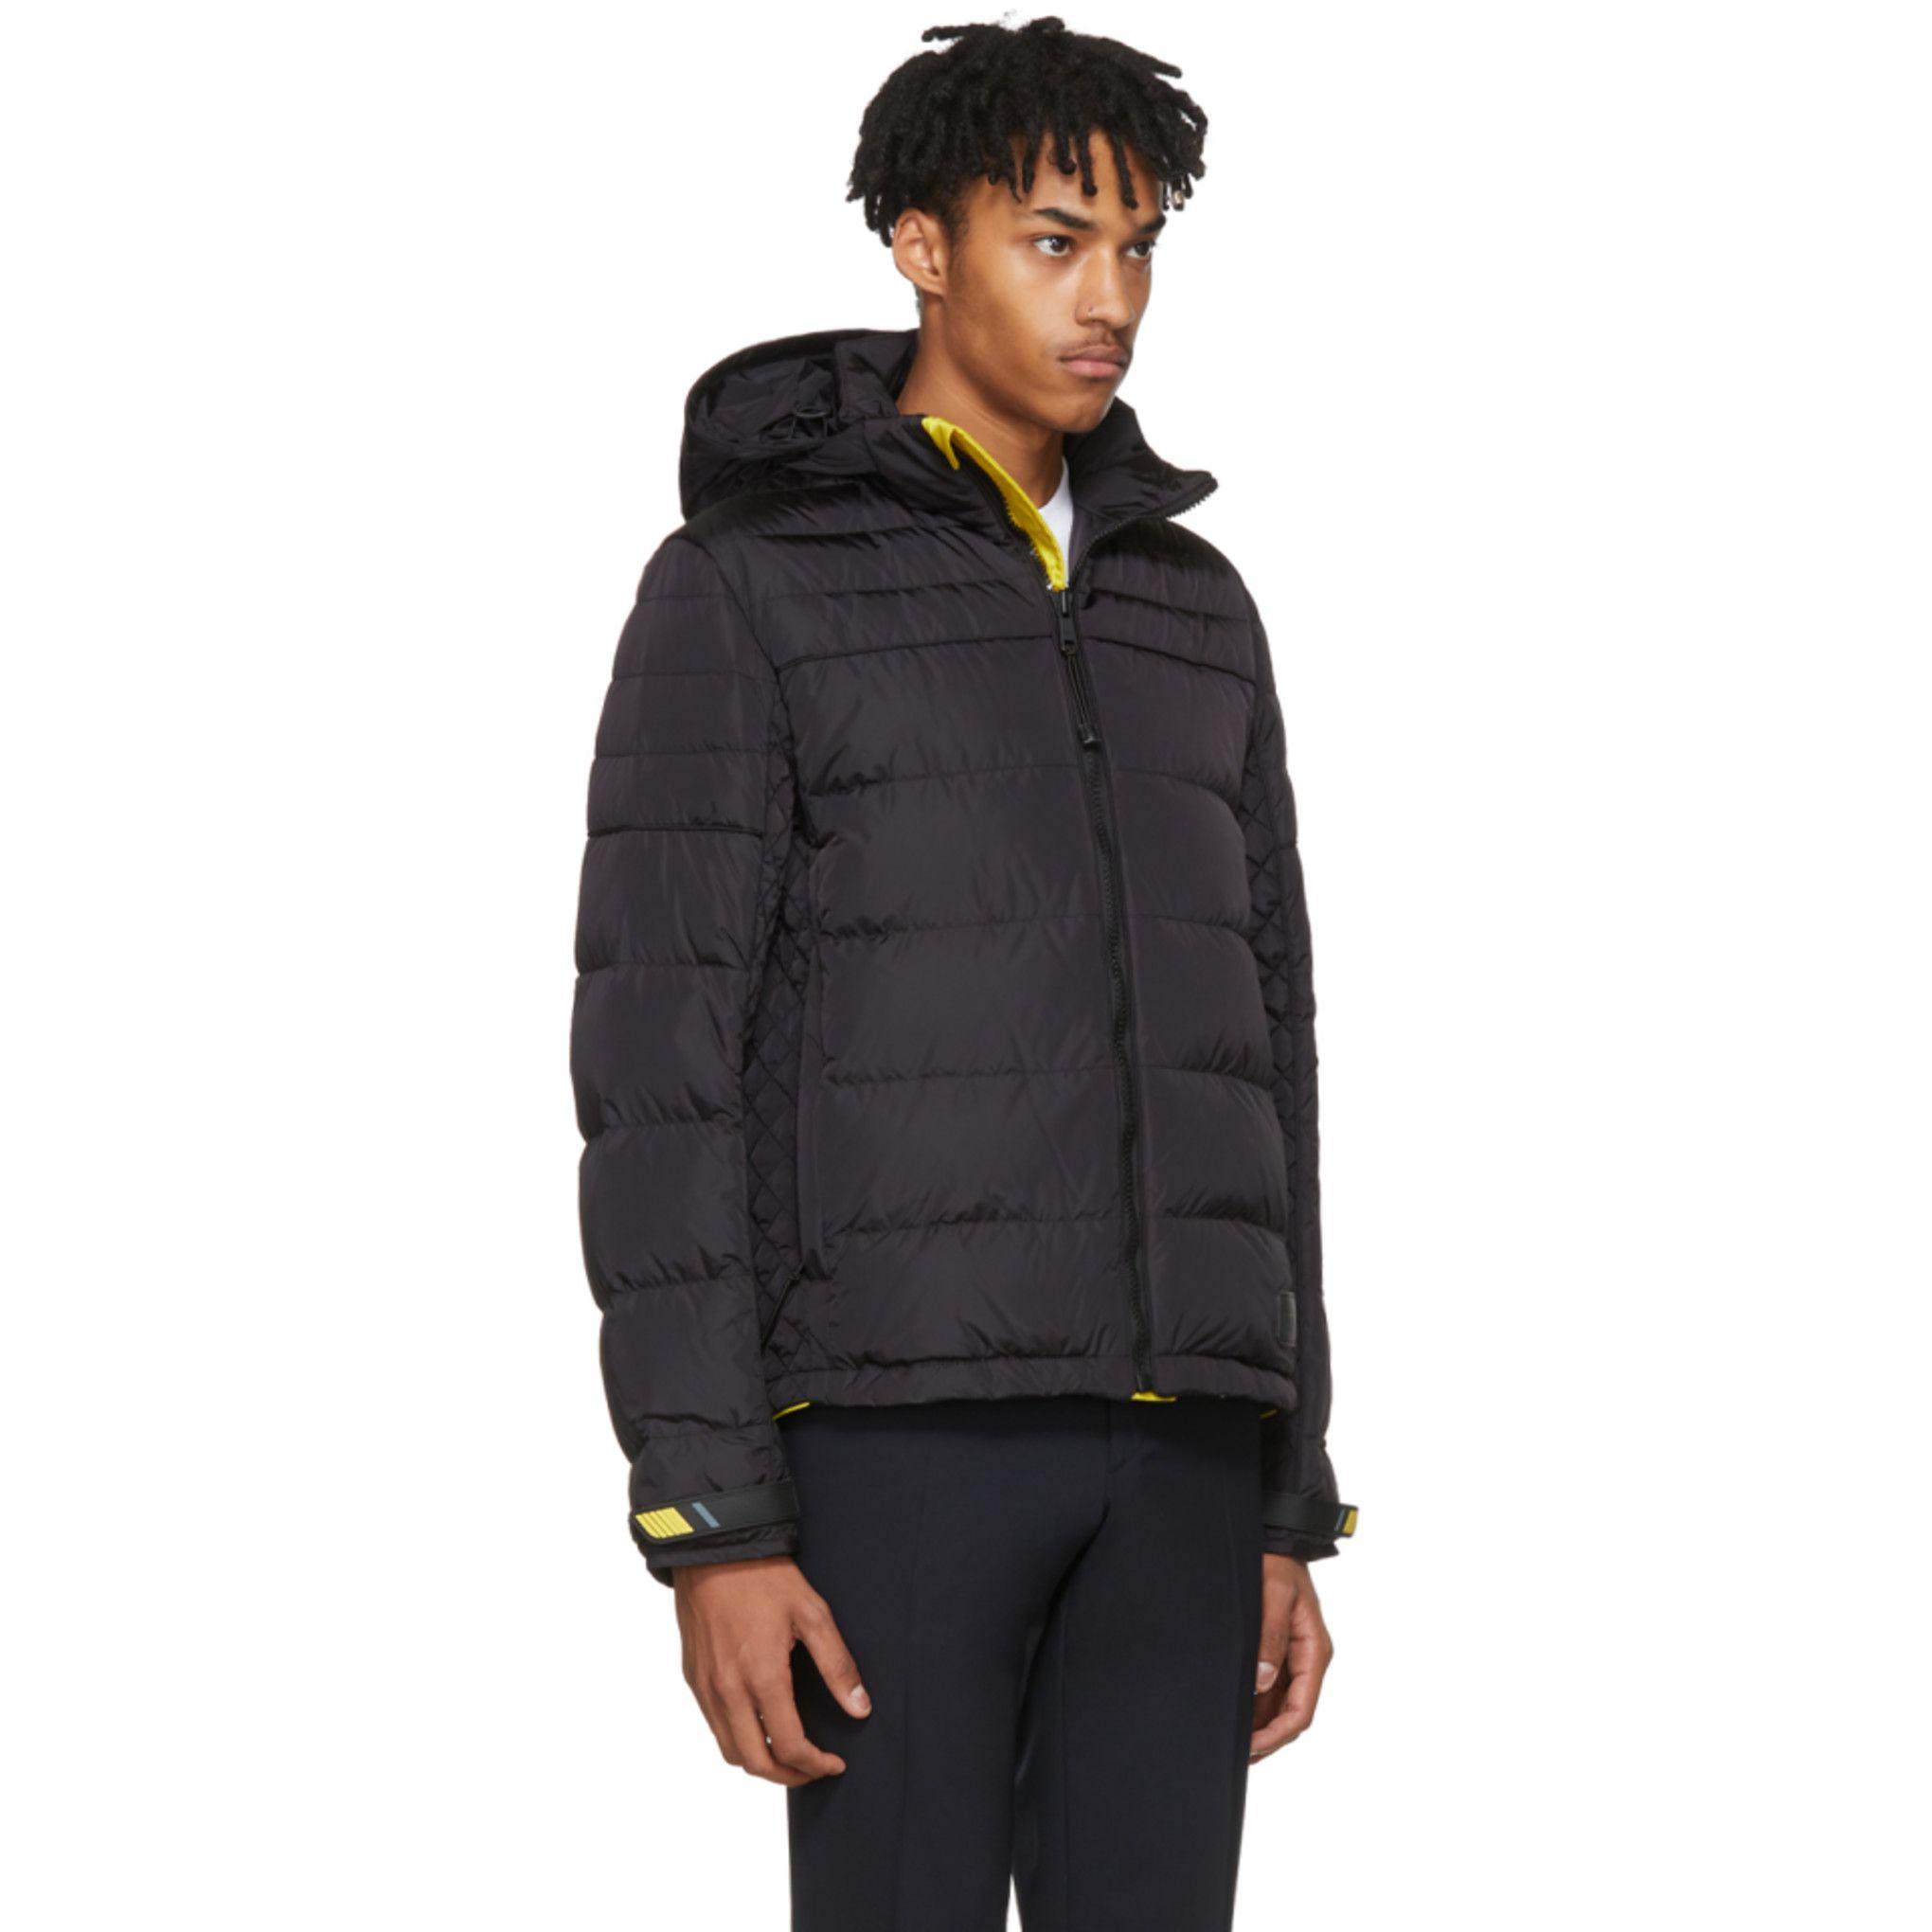 eb5c710c15 Prada - Black & Yellow Down Lightweight Puffer Jacket | Mont